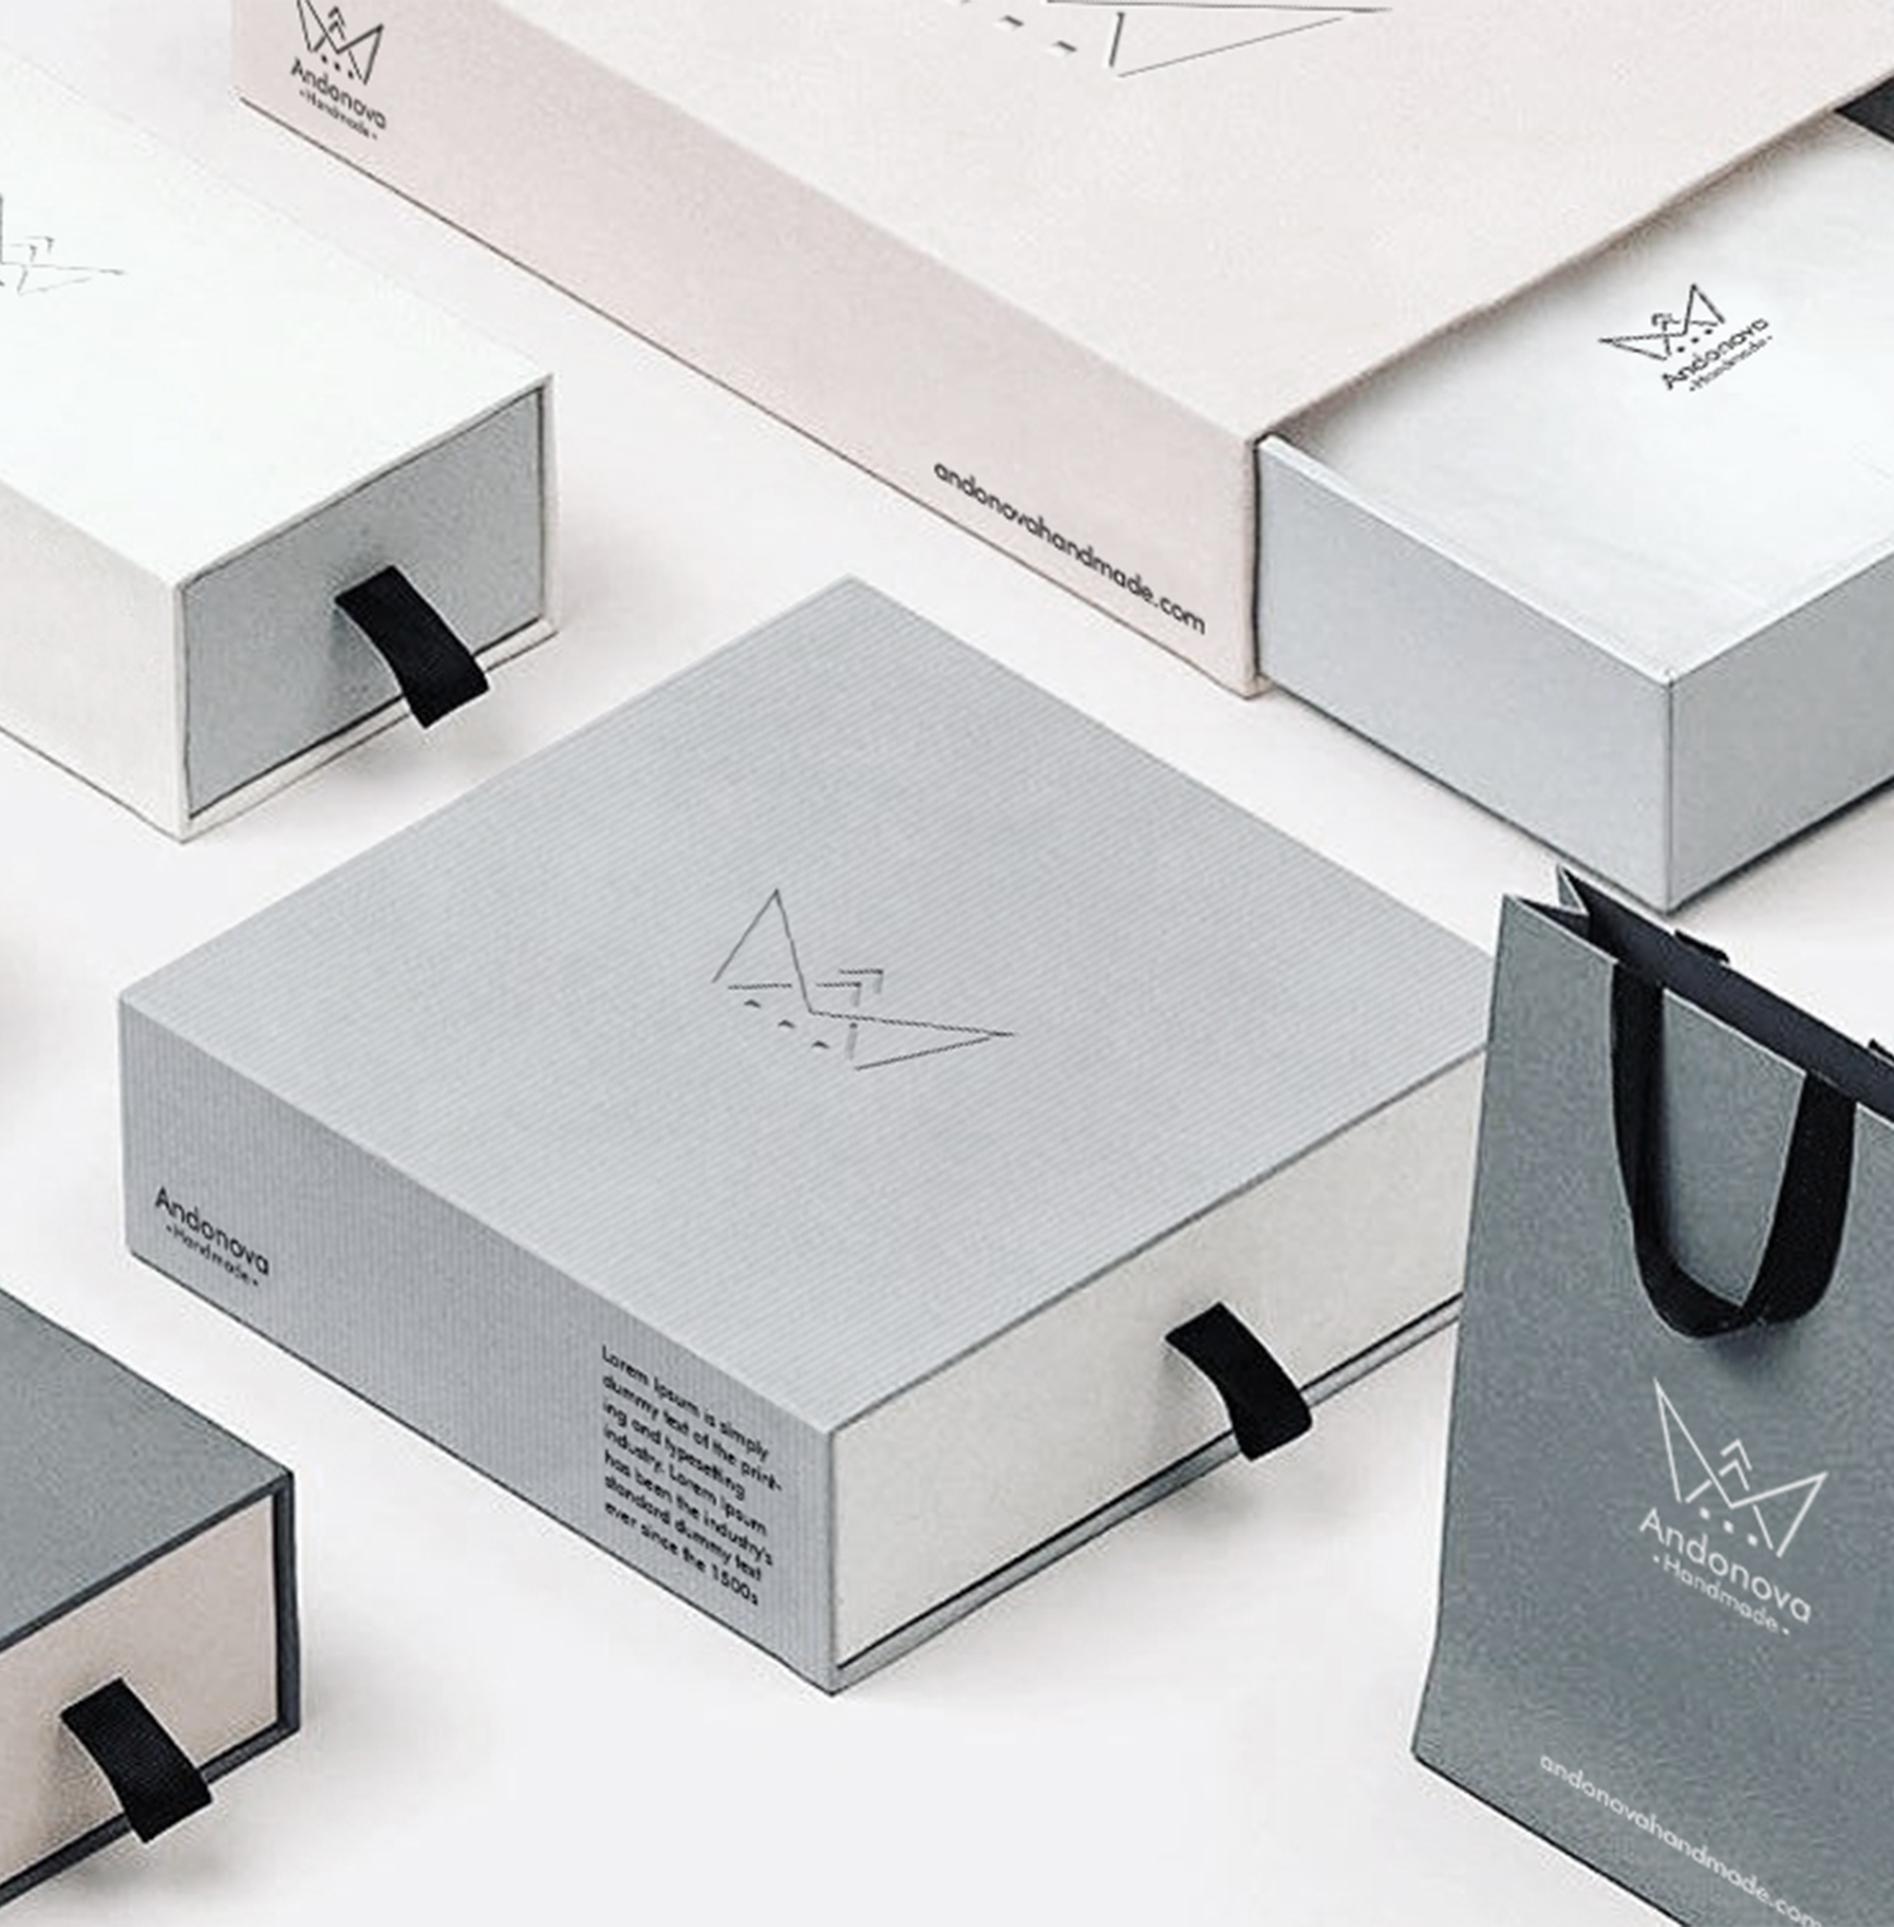 Packaging design for Andonova premium jewelry